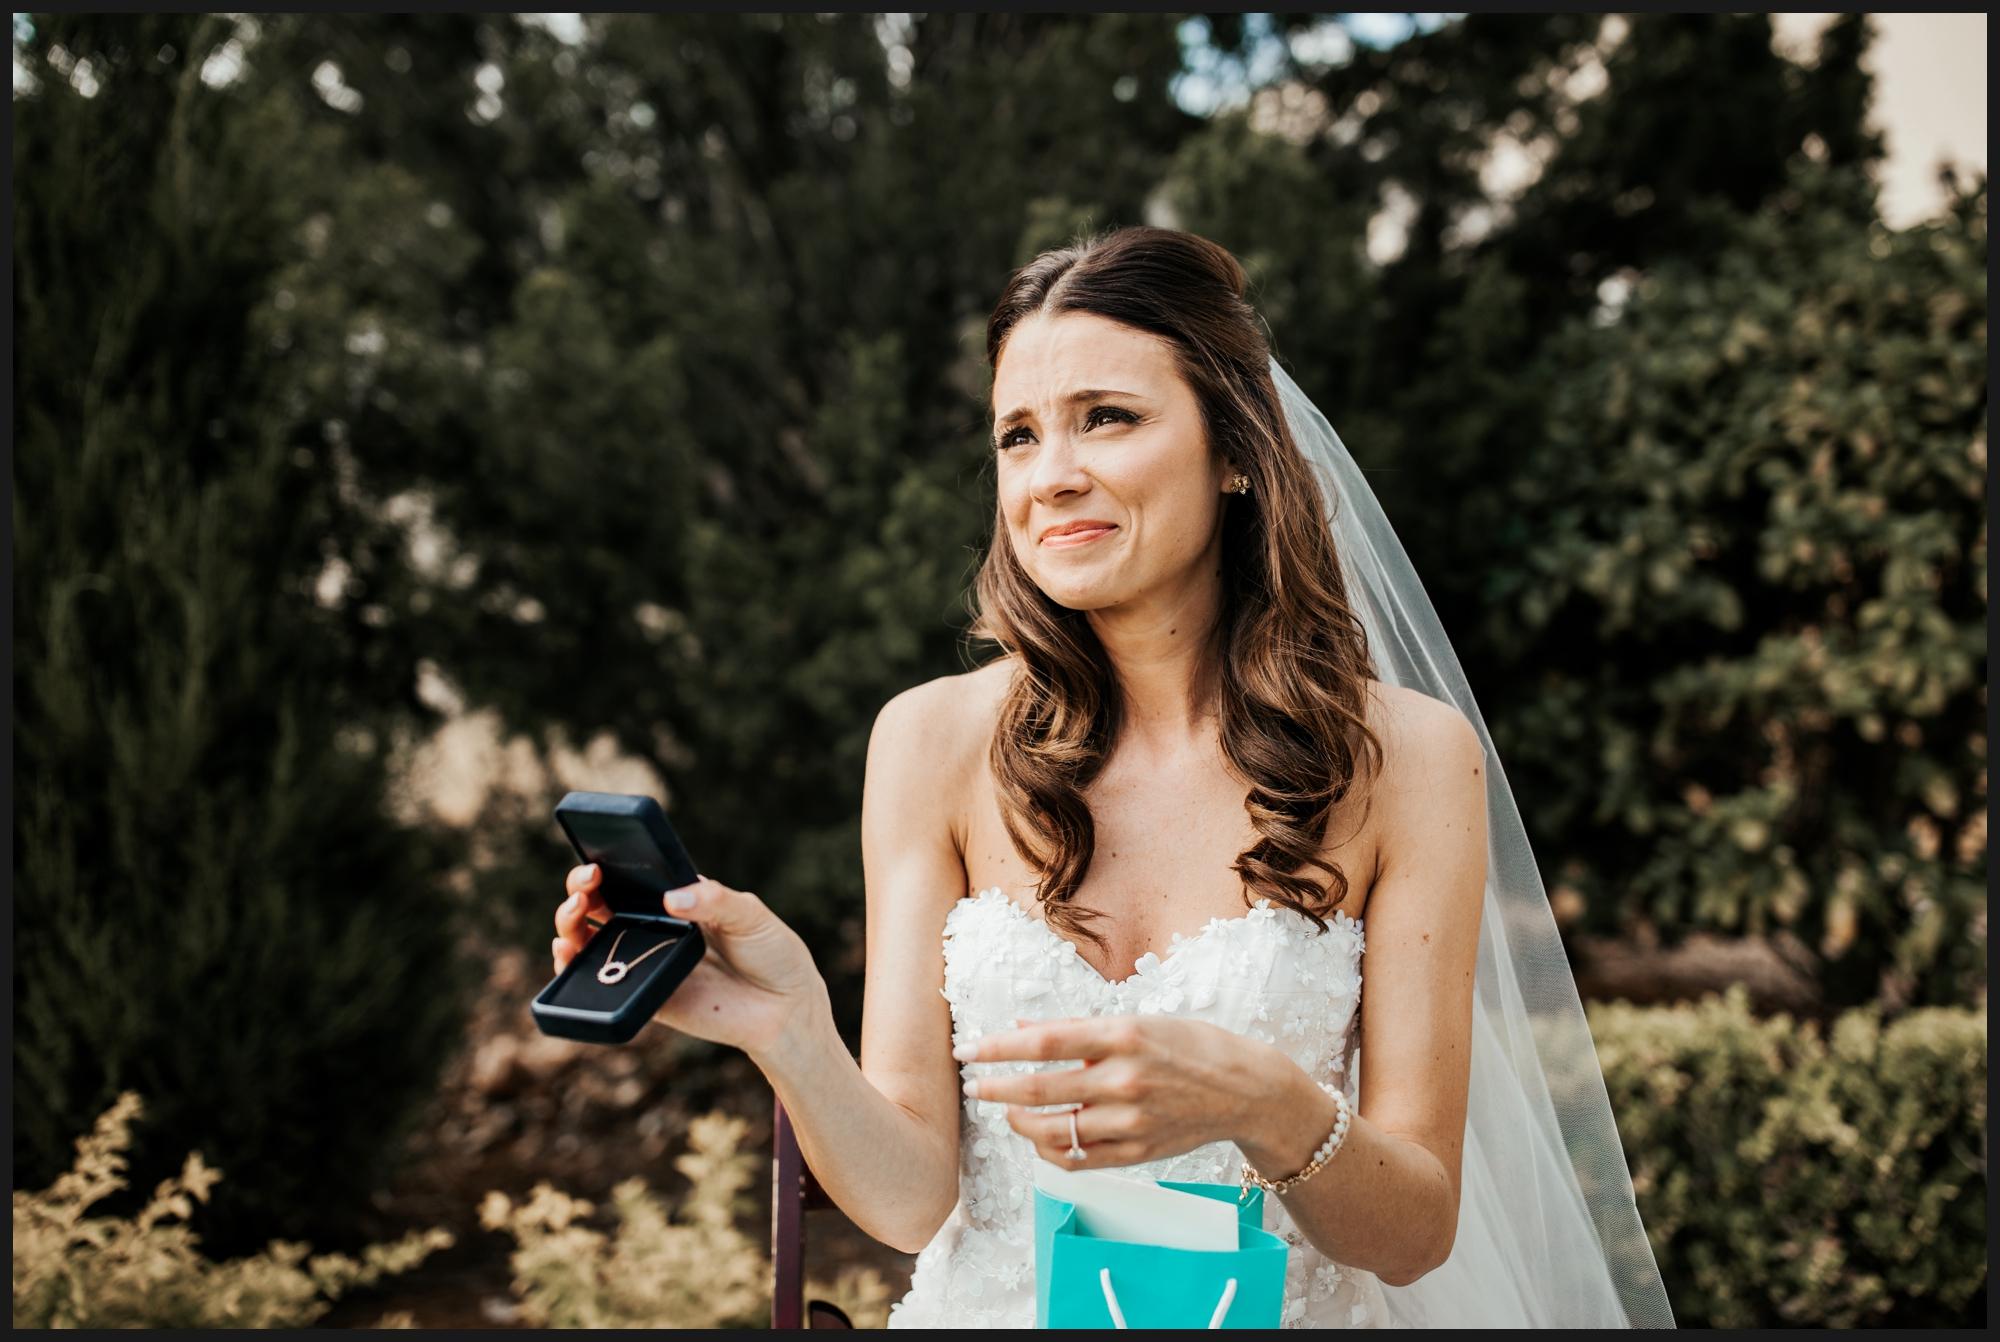 Orlando-Wedding-Photographer-destination-wedding-photographer-florida-wedding-photographer-hawaii-wedding-photographer_0206.jpg